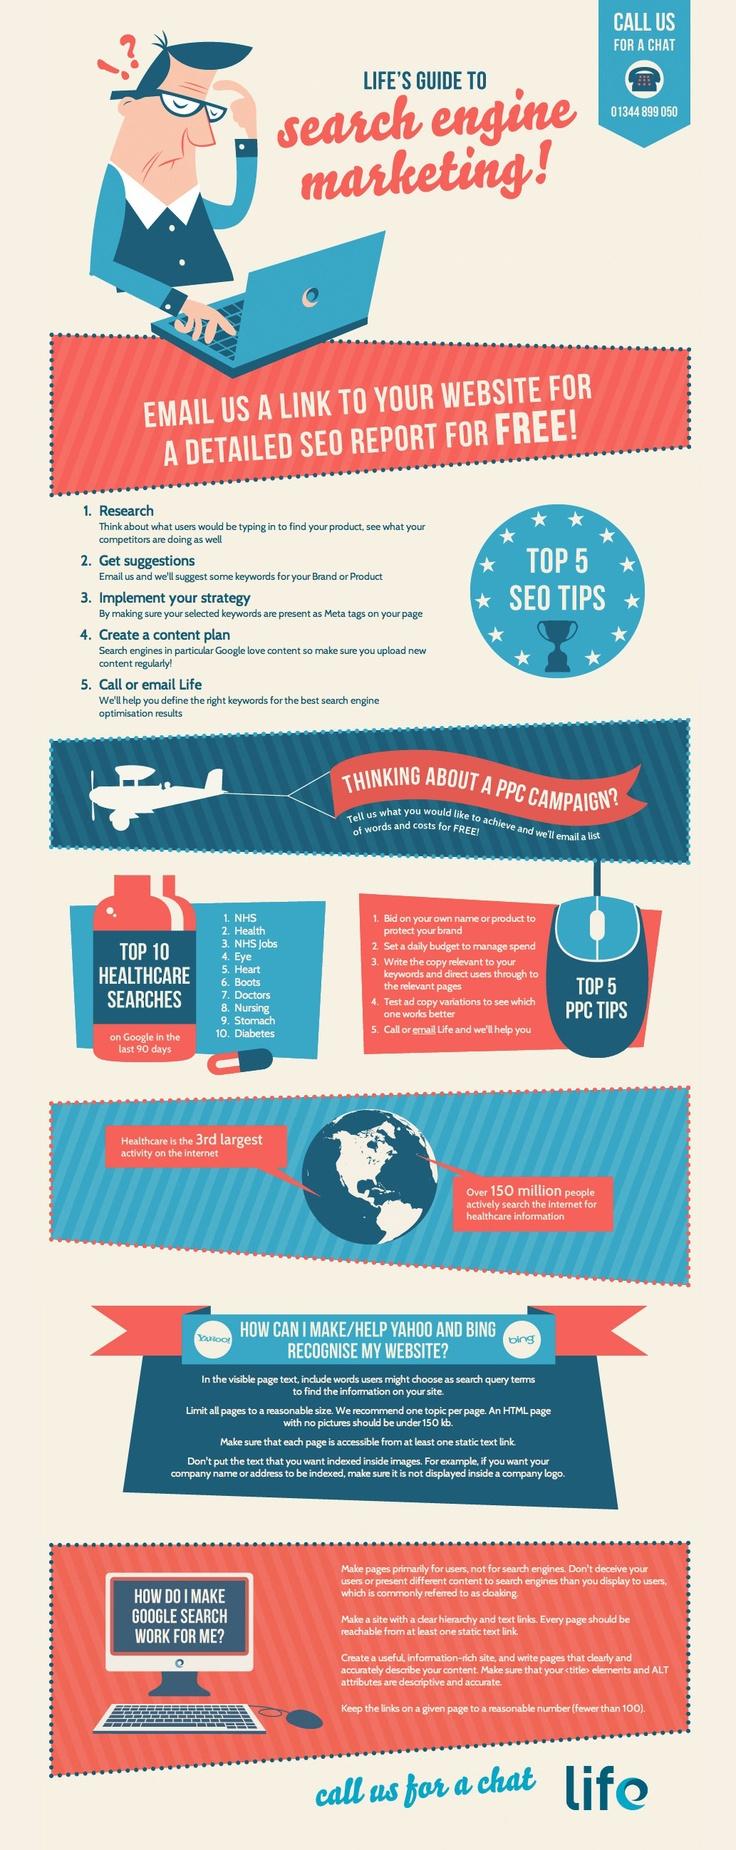 Brief guide to SEO marketing.